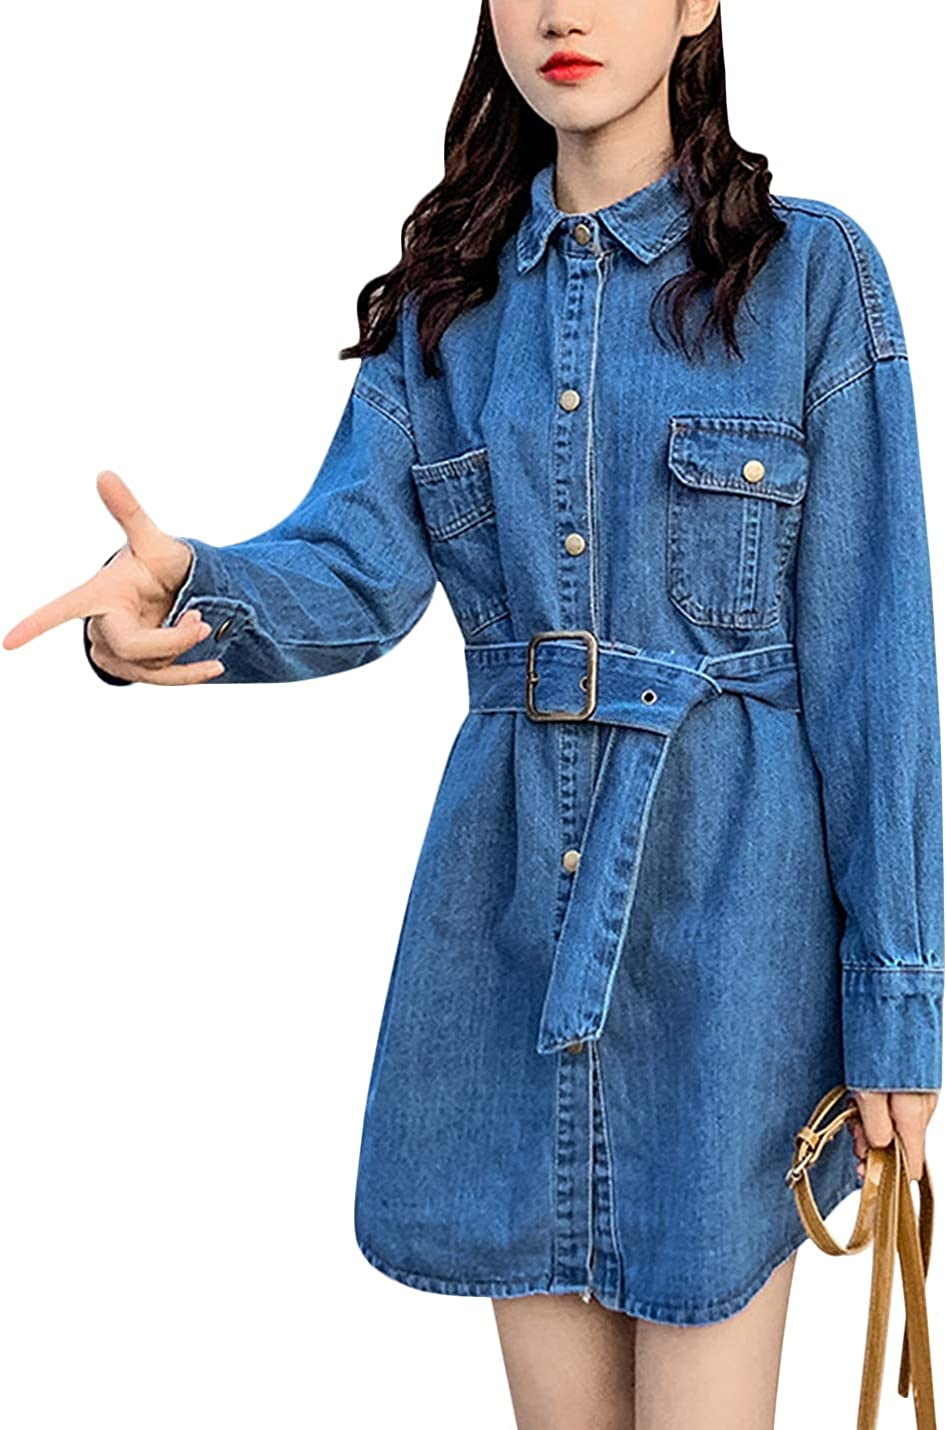 Uaneo Women's Loose Lapel Buttons Up Mid Long Denim Shirt Jacket with Belt (Dark Blue, Medium)